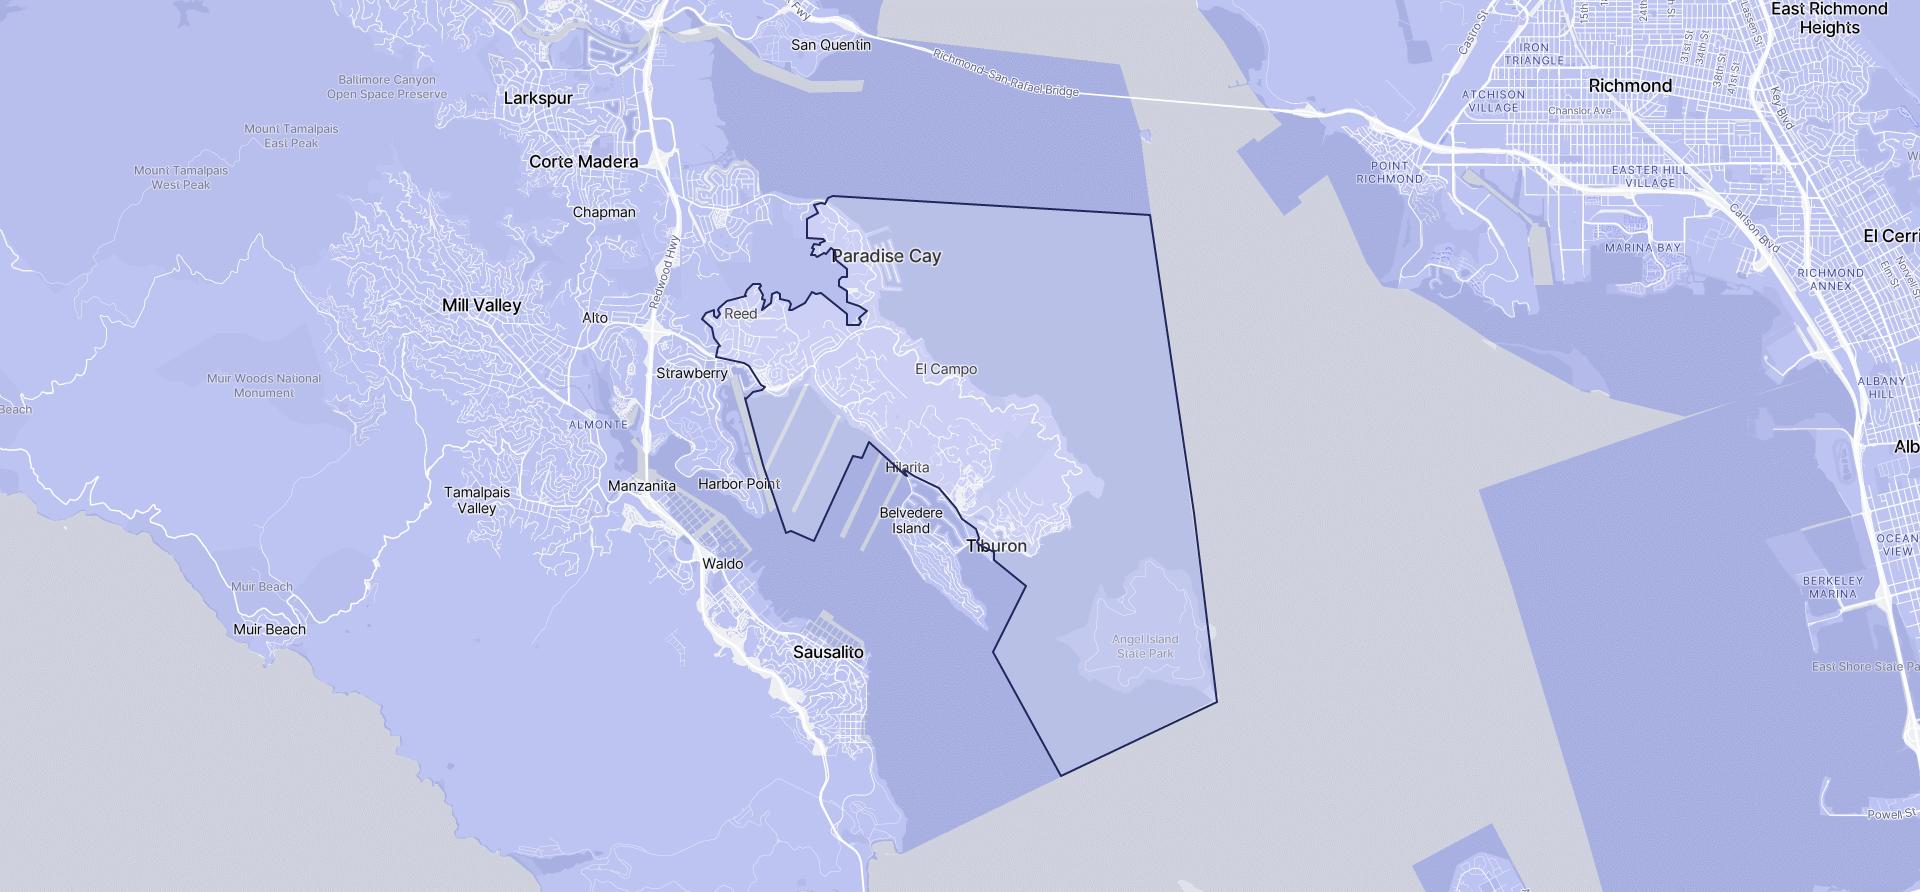 Image of Tiburon boundaries on a map.